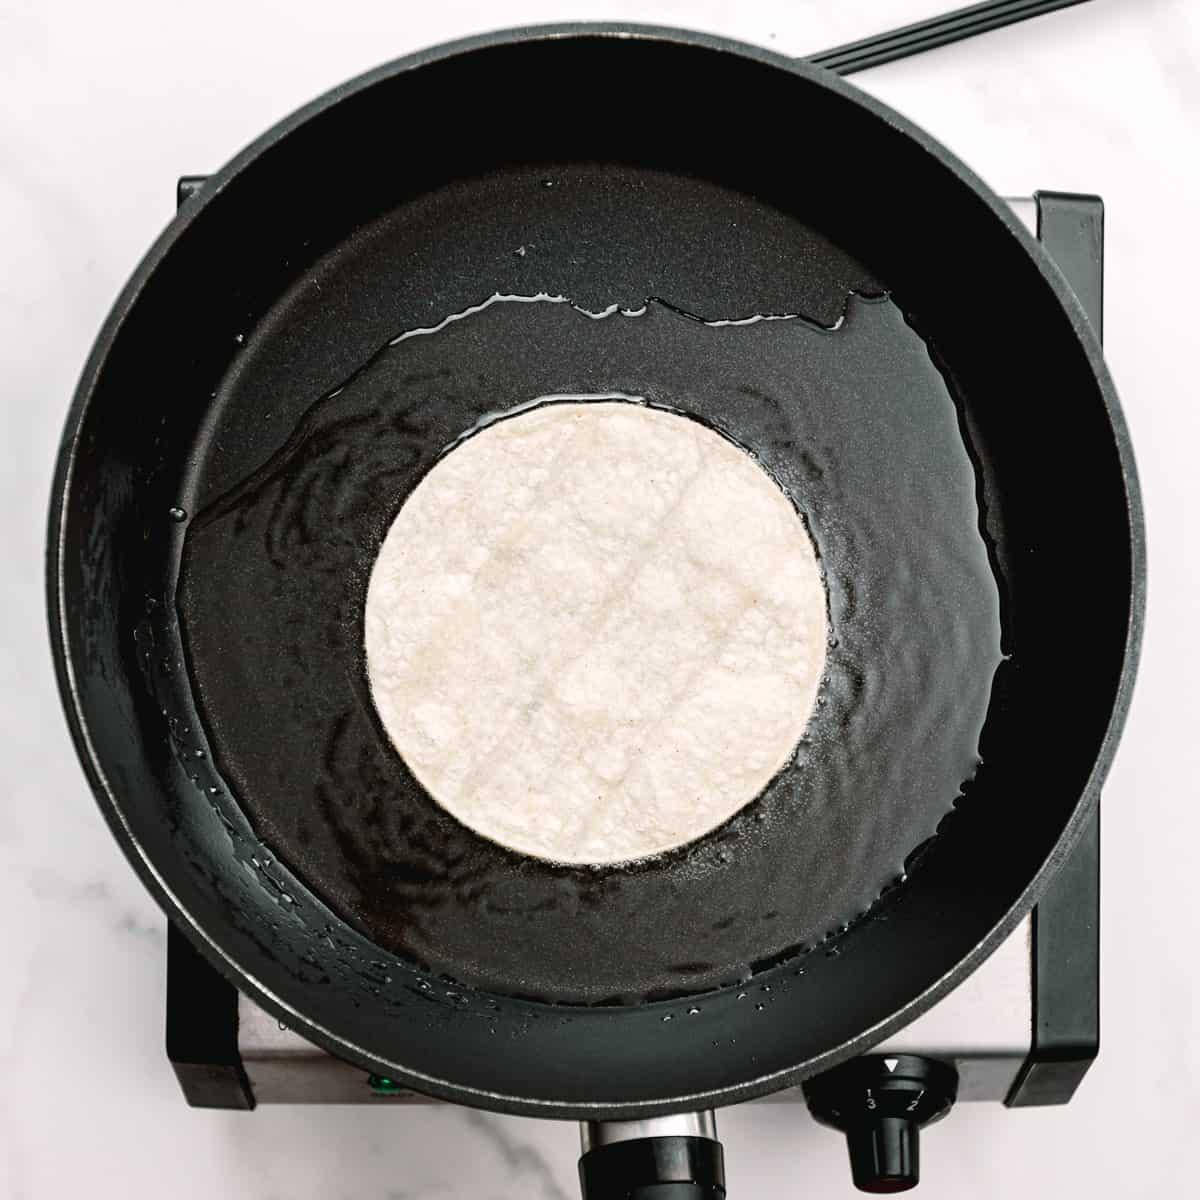 frying corn tortillas.